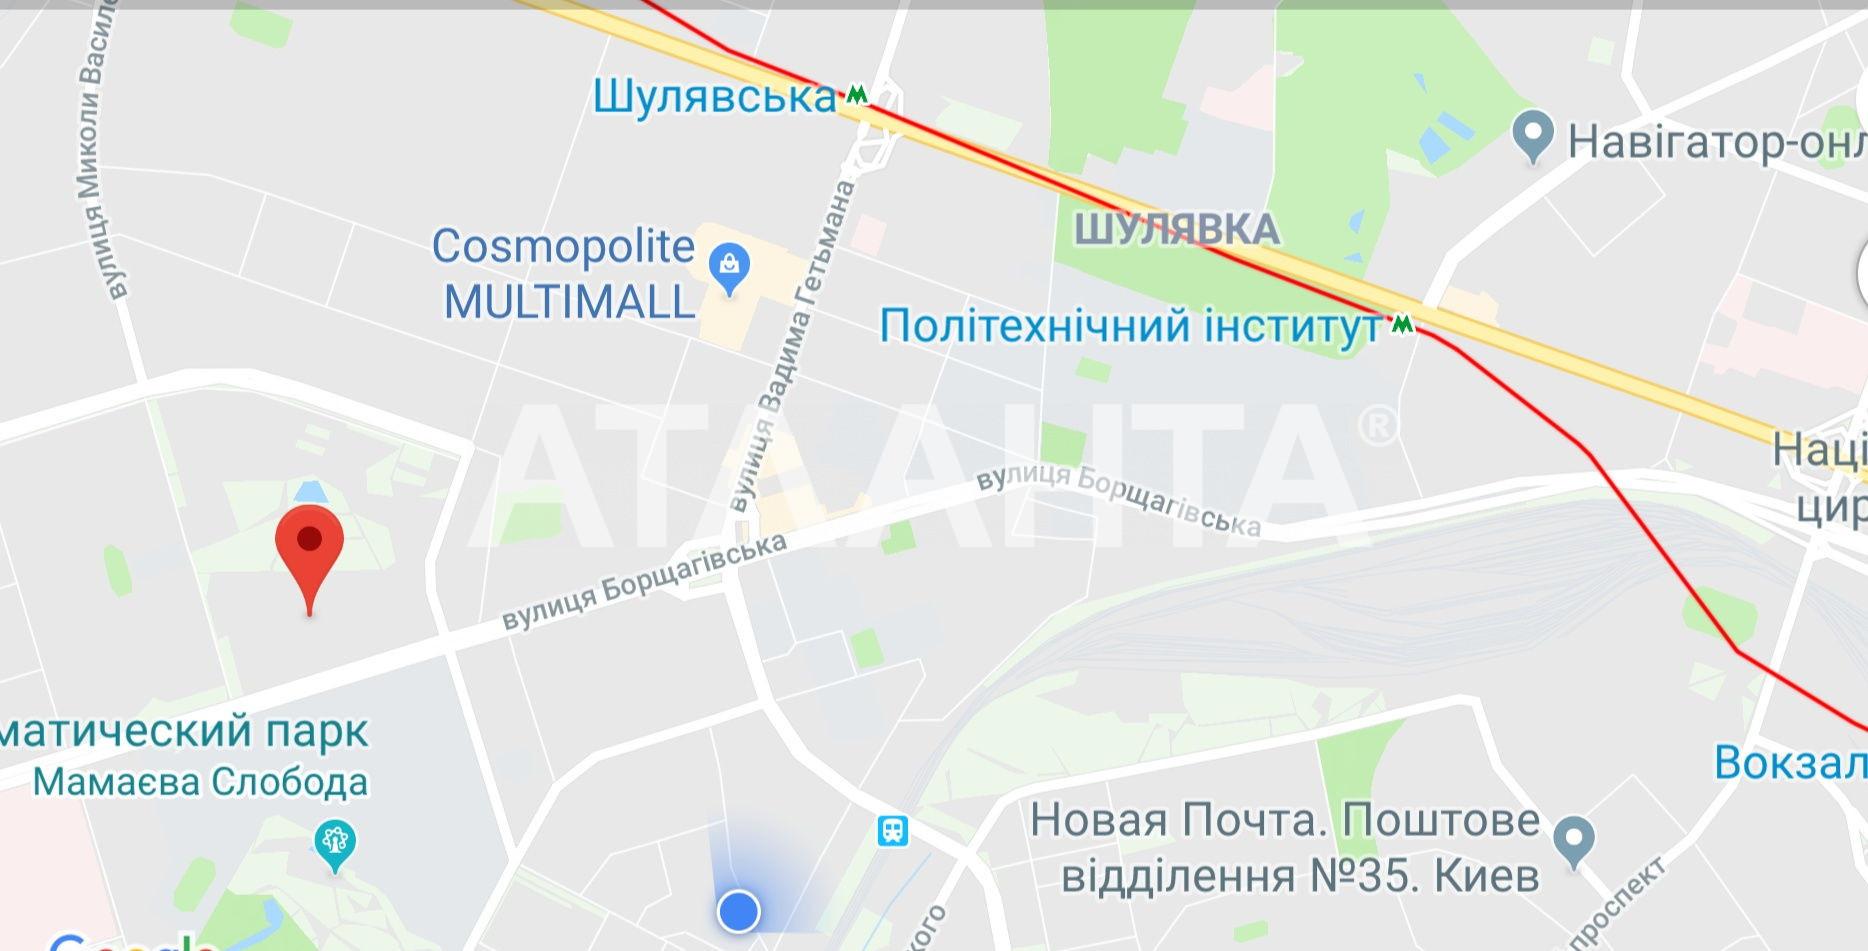 Продается 3-комнатная Квартира на ул. Проспект Космонавта Комарова — 60 000 у.е. (фото №22)